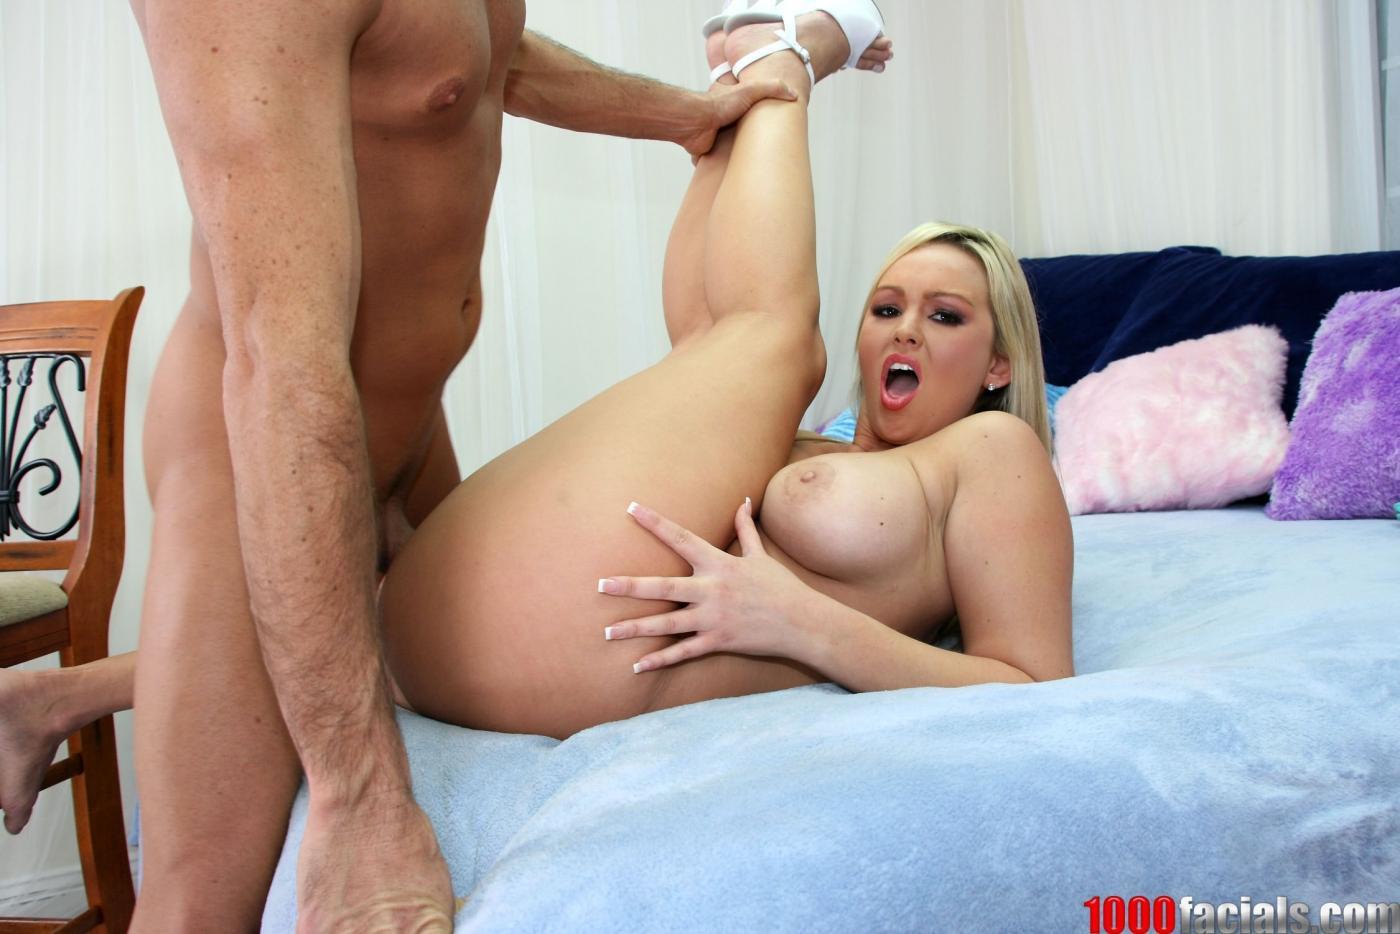 Deep penetration and men